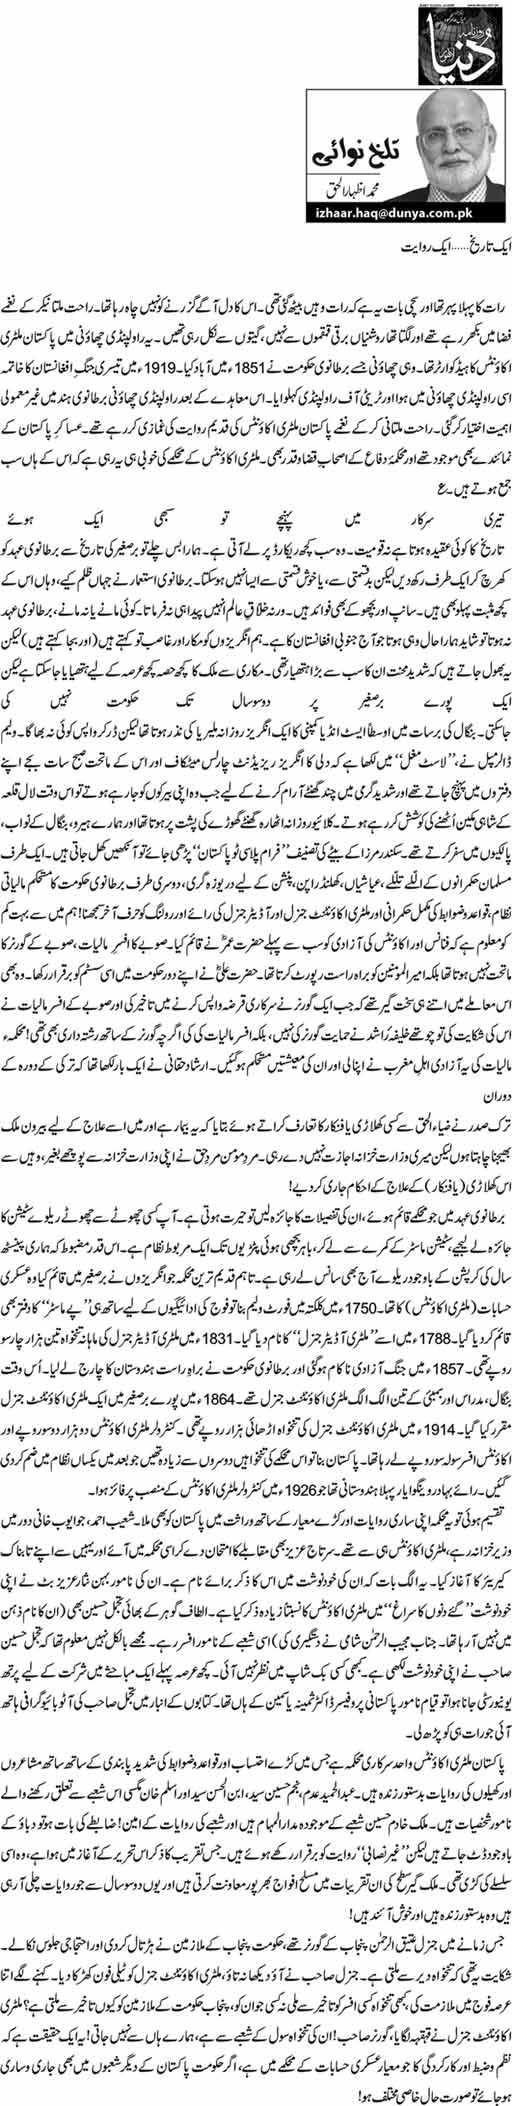 Aik Tareekh...Aik Riwayat - M. Izhar ul Haq